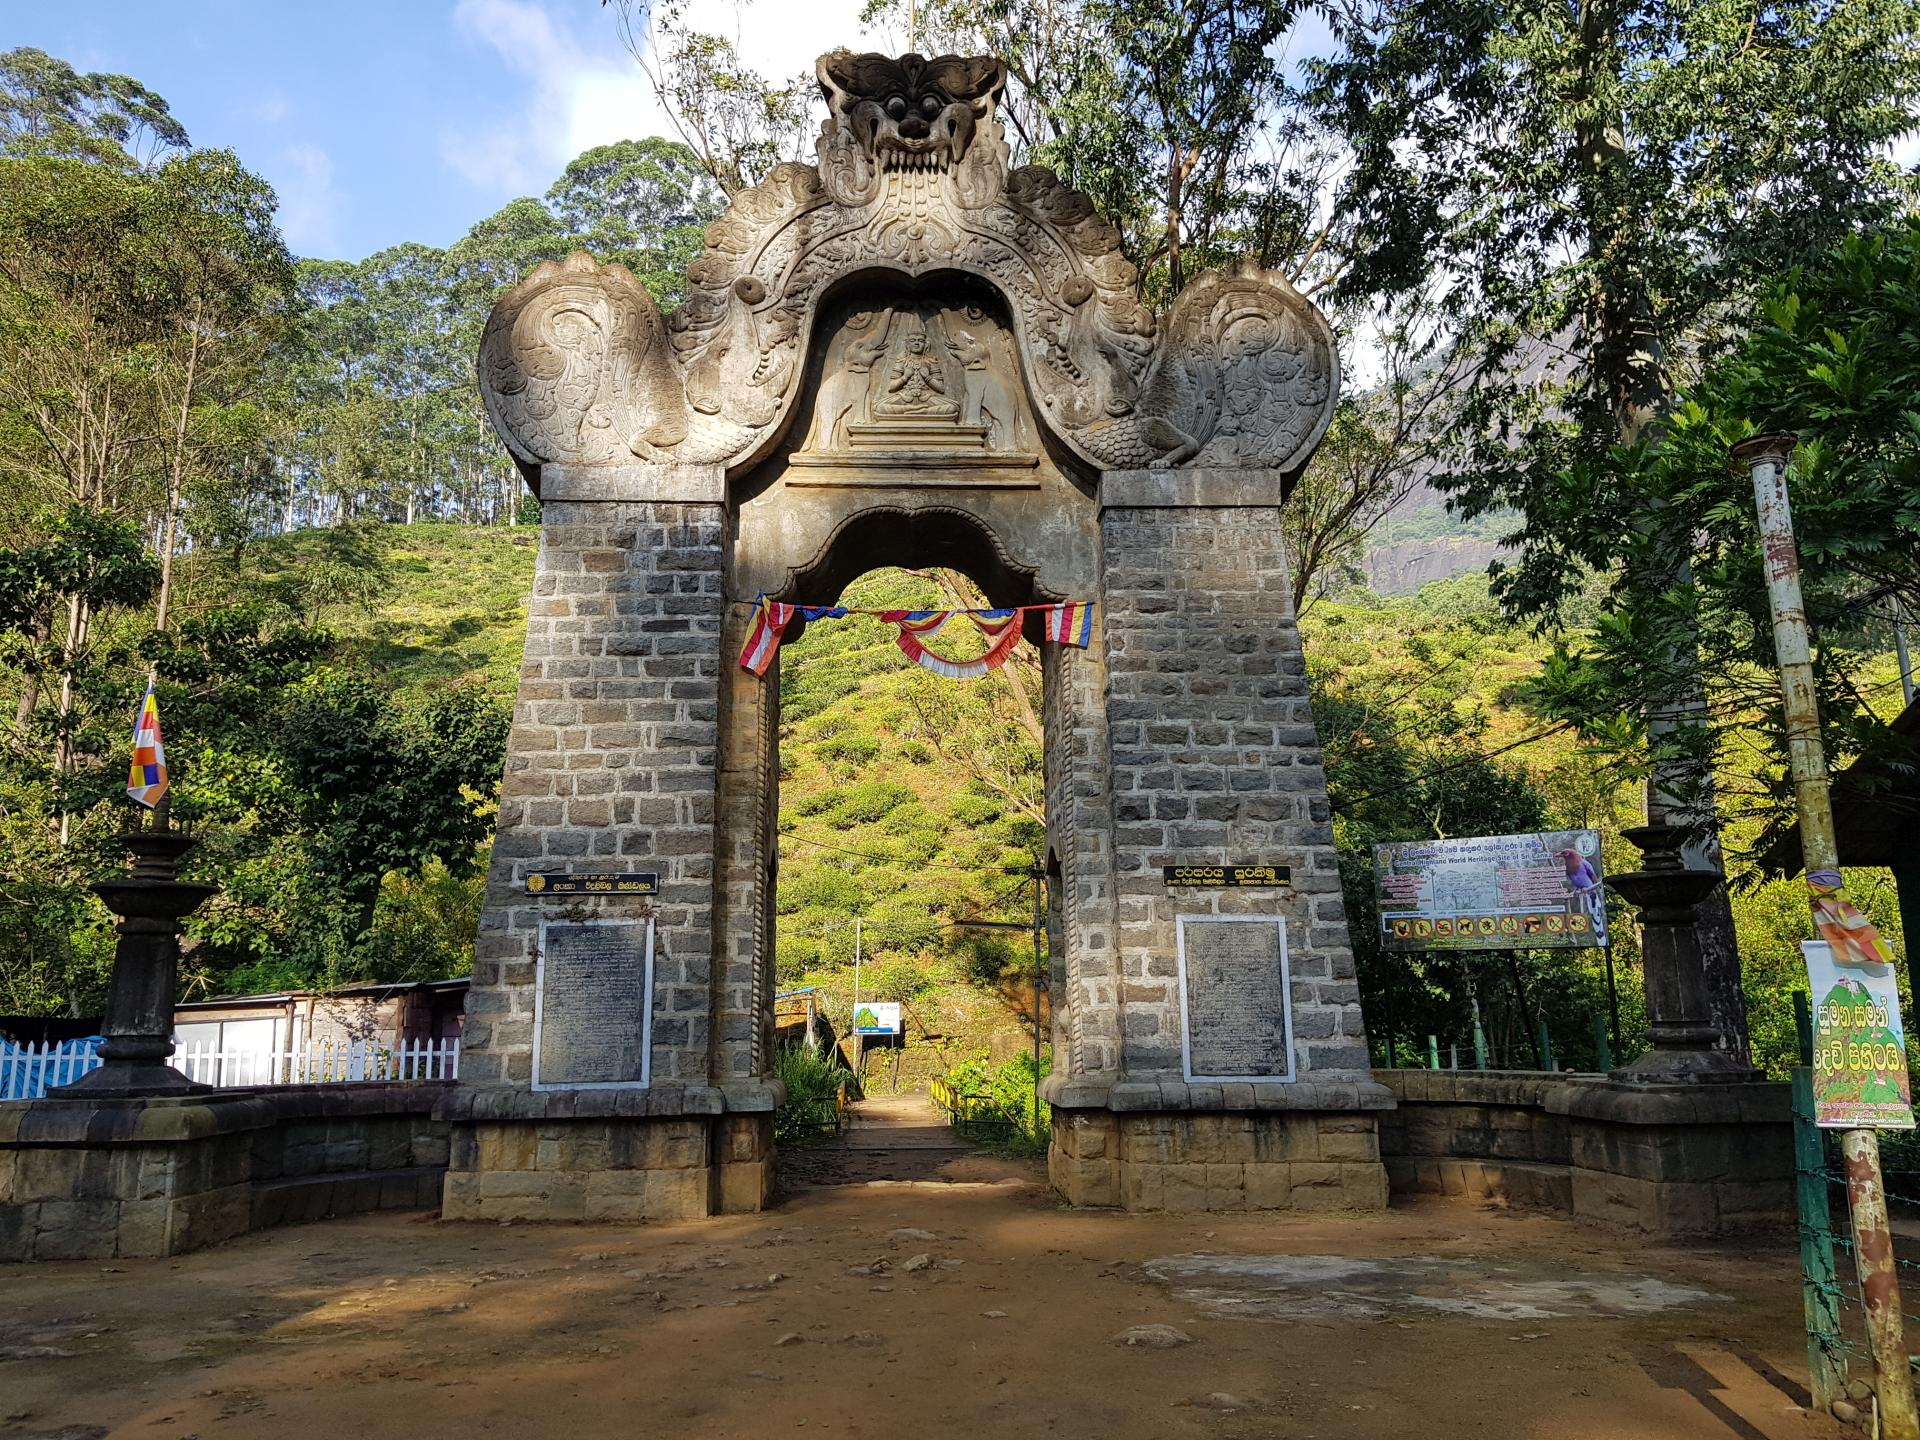 каменные ворота на тропу к пику Адама, Шри-Ланка